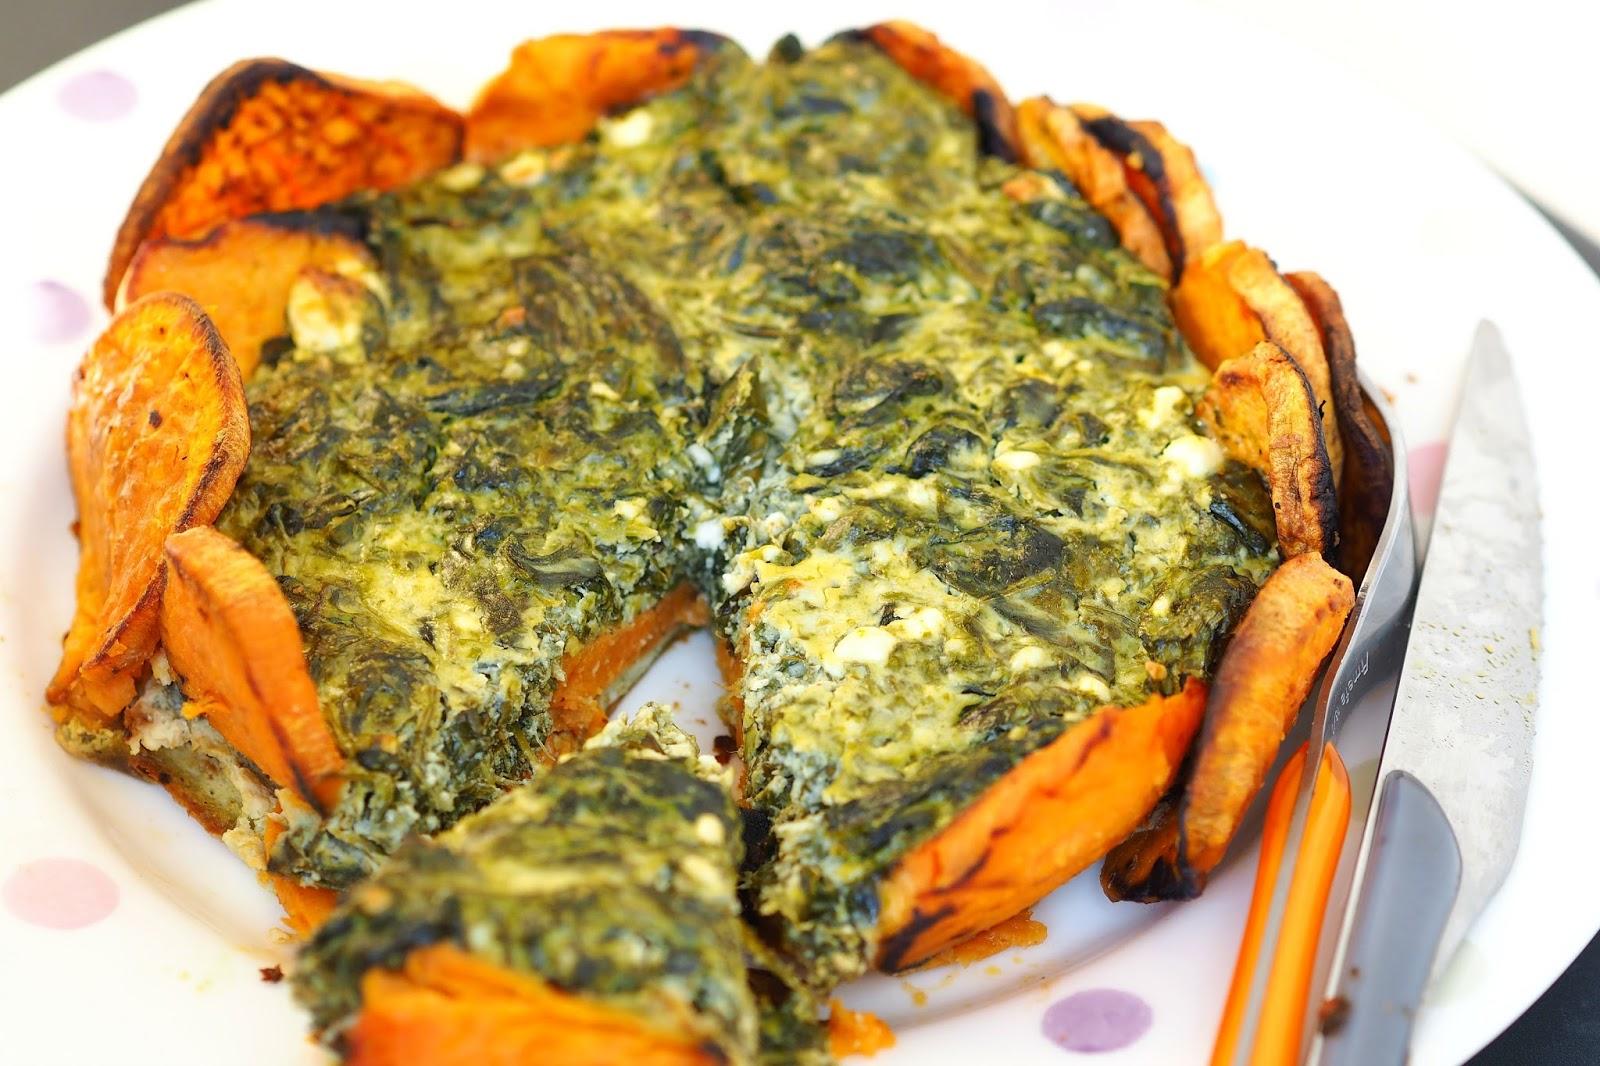 SHAKE UP YOUR SWEET POTATO | TORTA RECIPE - CarlyRowena |Potato Torta